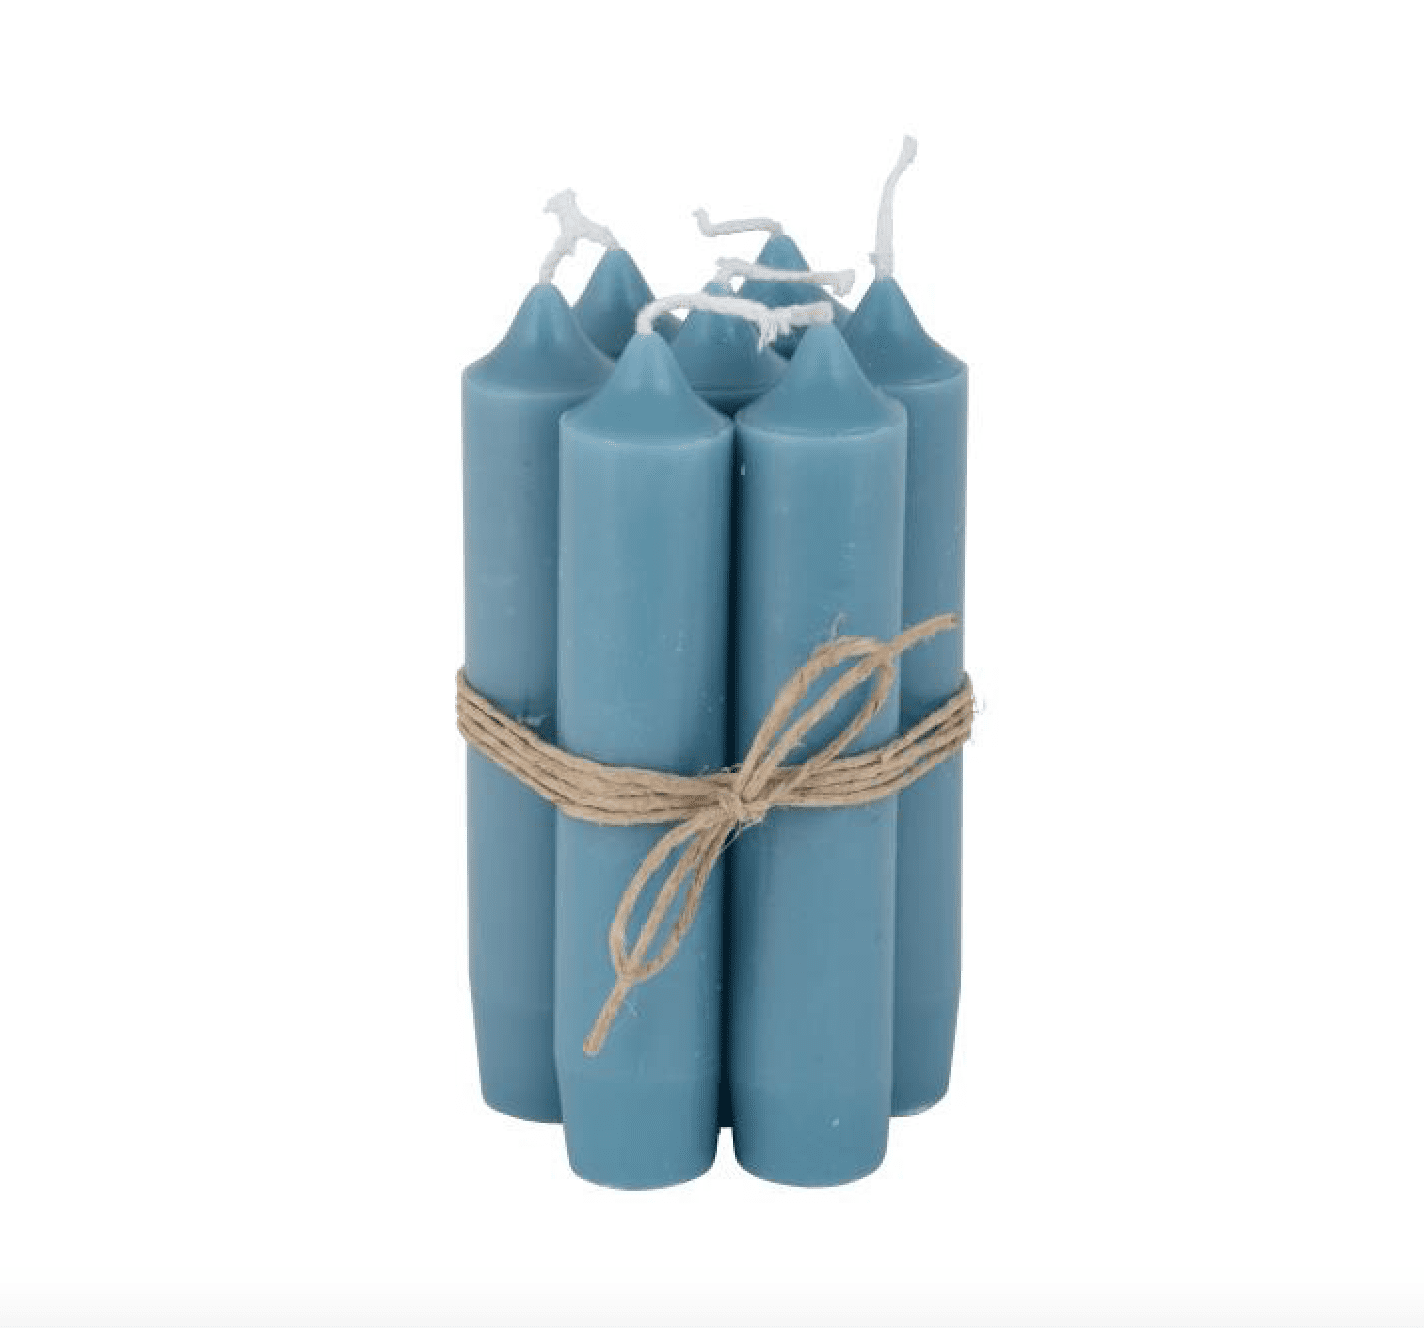 Set 6 candele corte – Blu petrolio